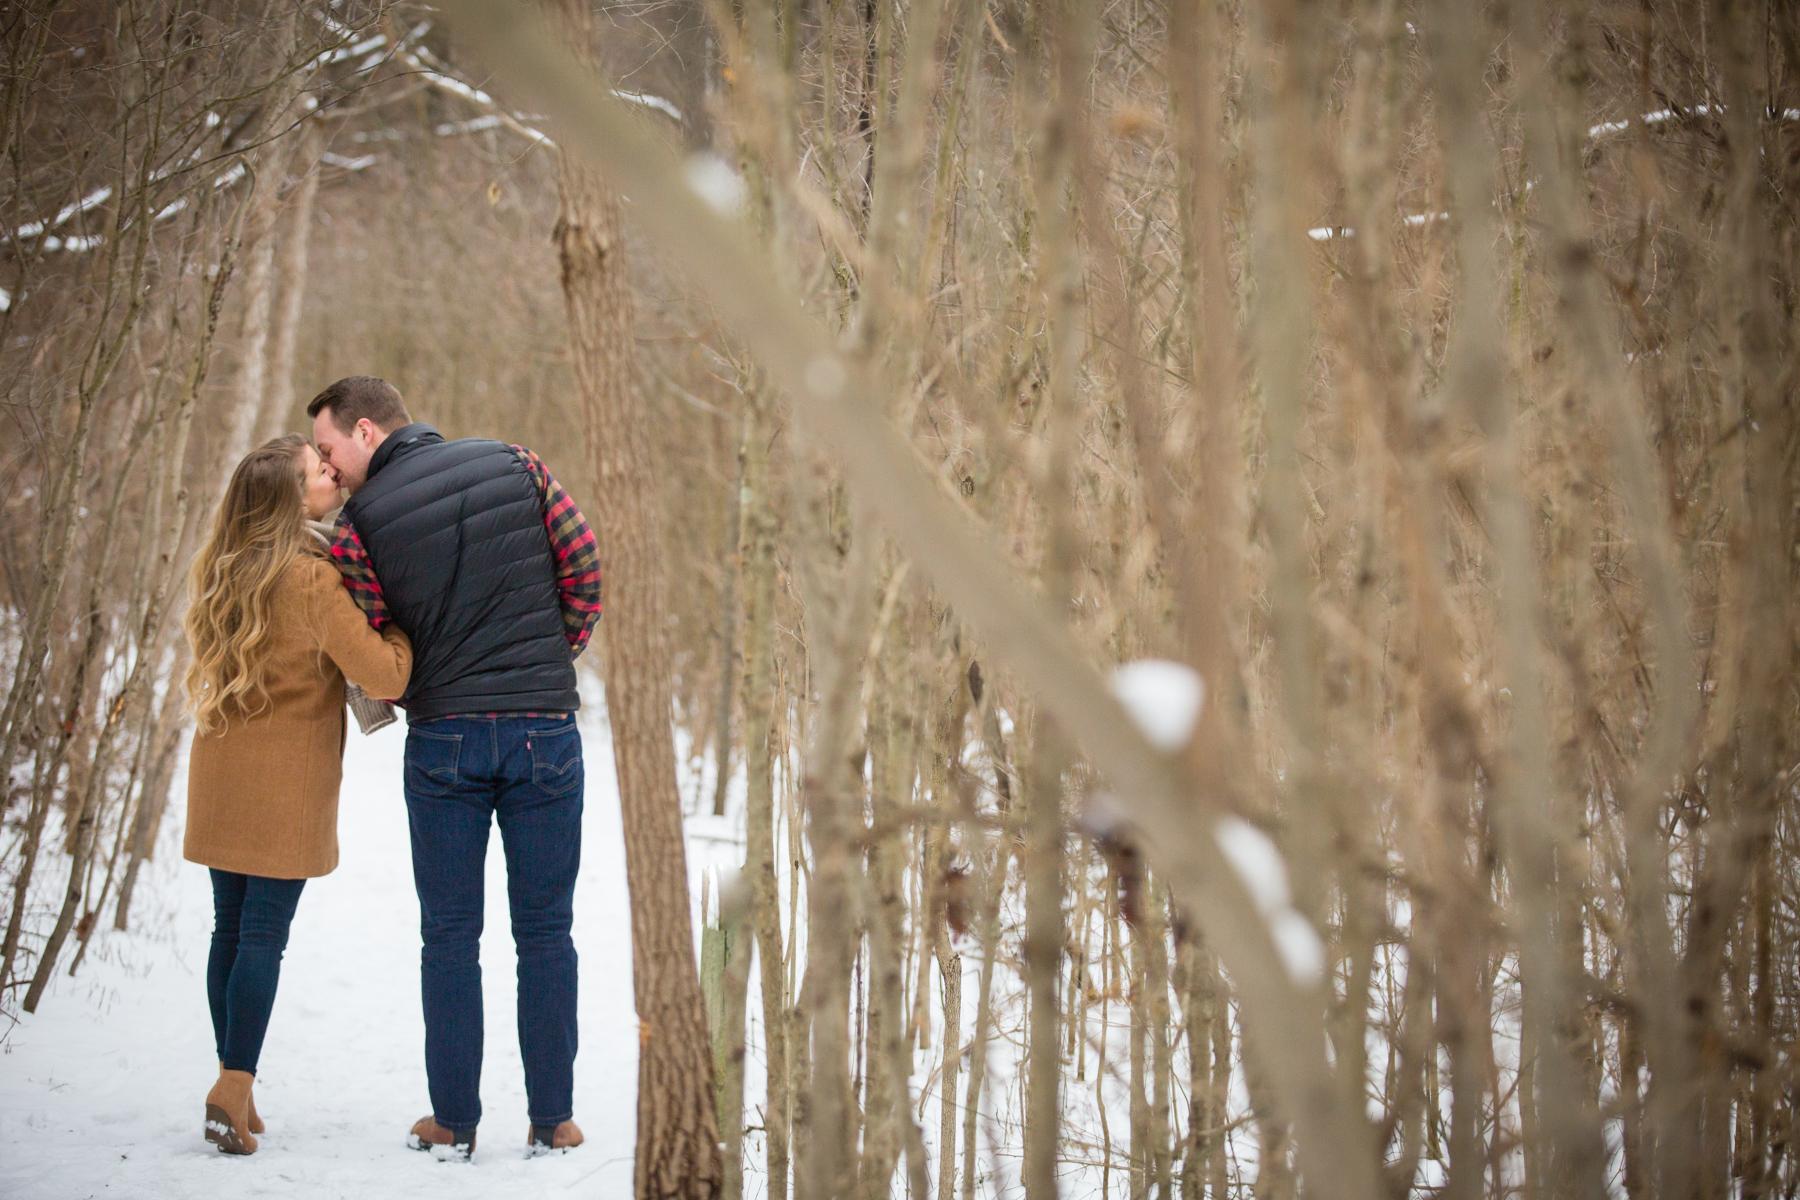 Doug&Kara_winter_Engagment_Photos_Brandon_Shafer_Photography_Blog-5.jpg